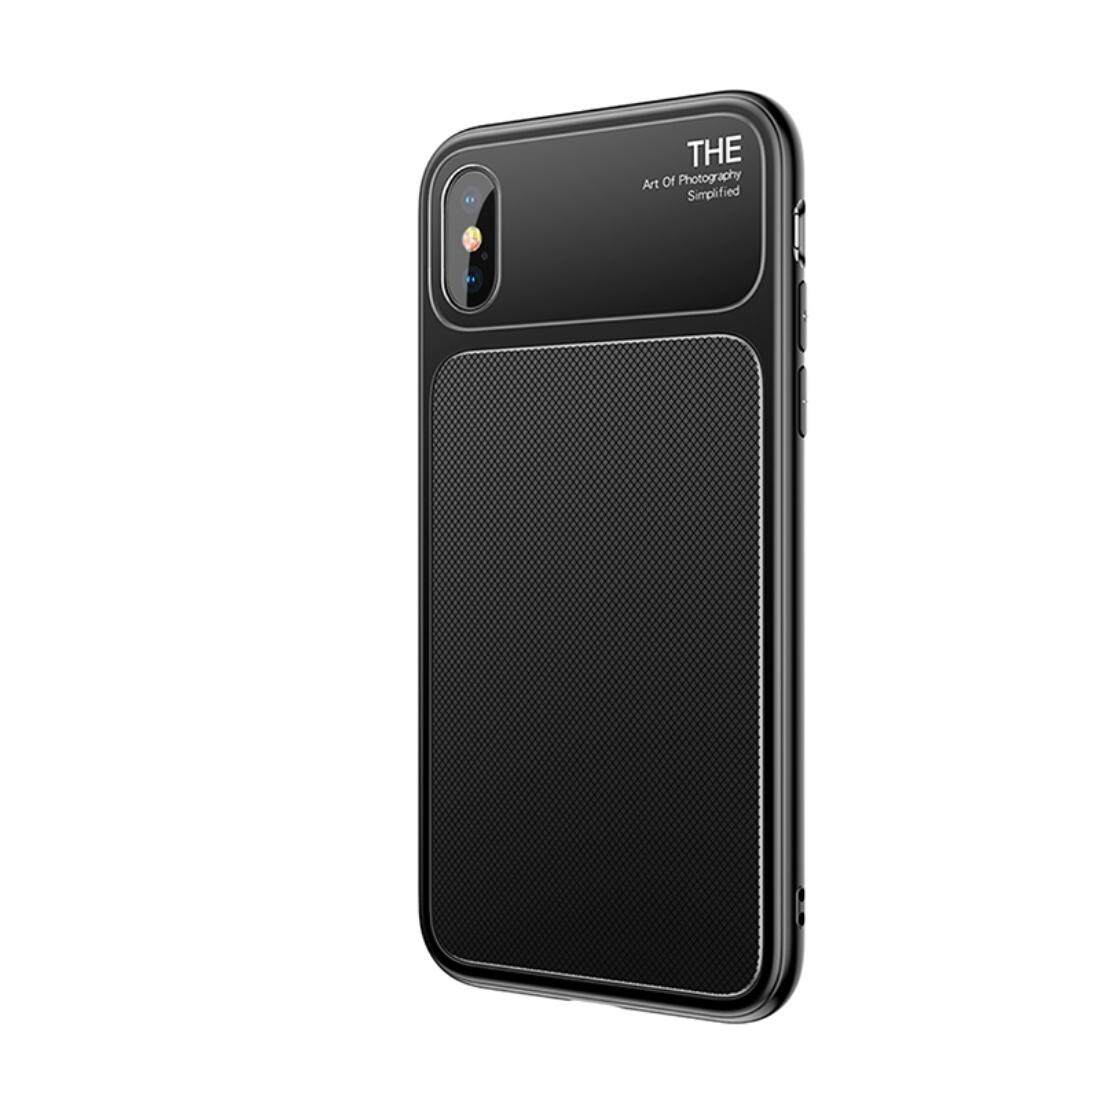 BASEUS untuk iPhone X TPU Hombic Tekstur Pelindung Penutup Belakang Case ( Hitam)-Intl